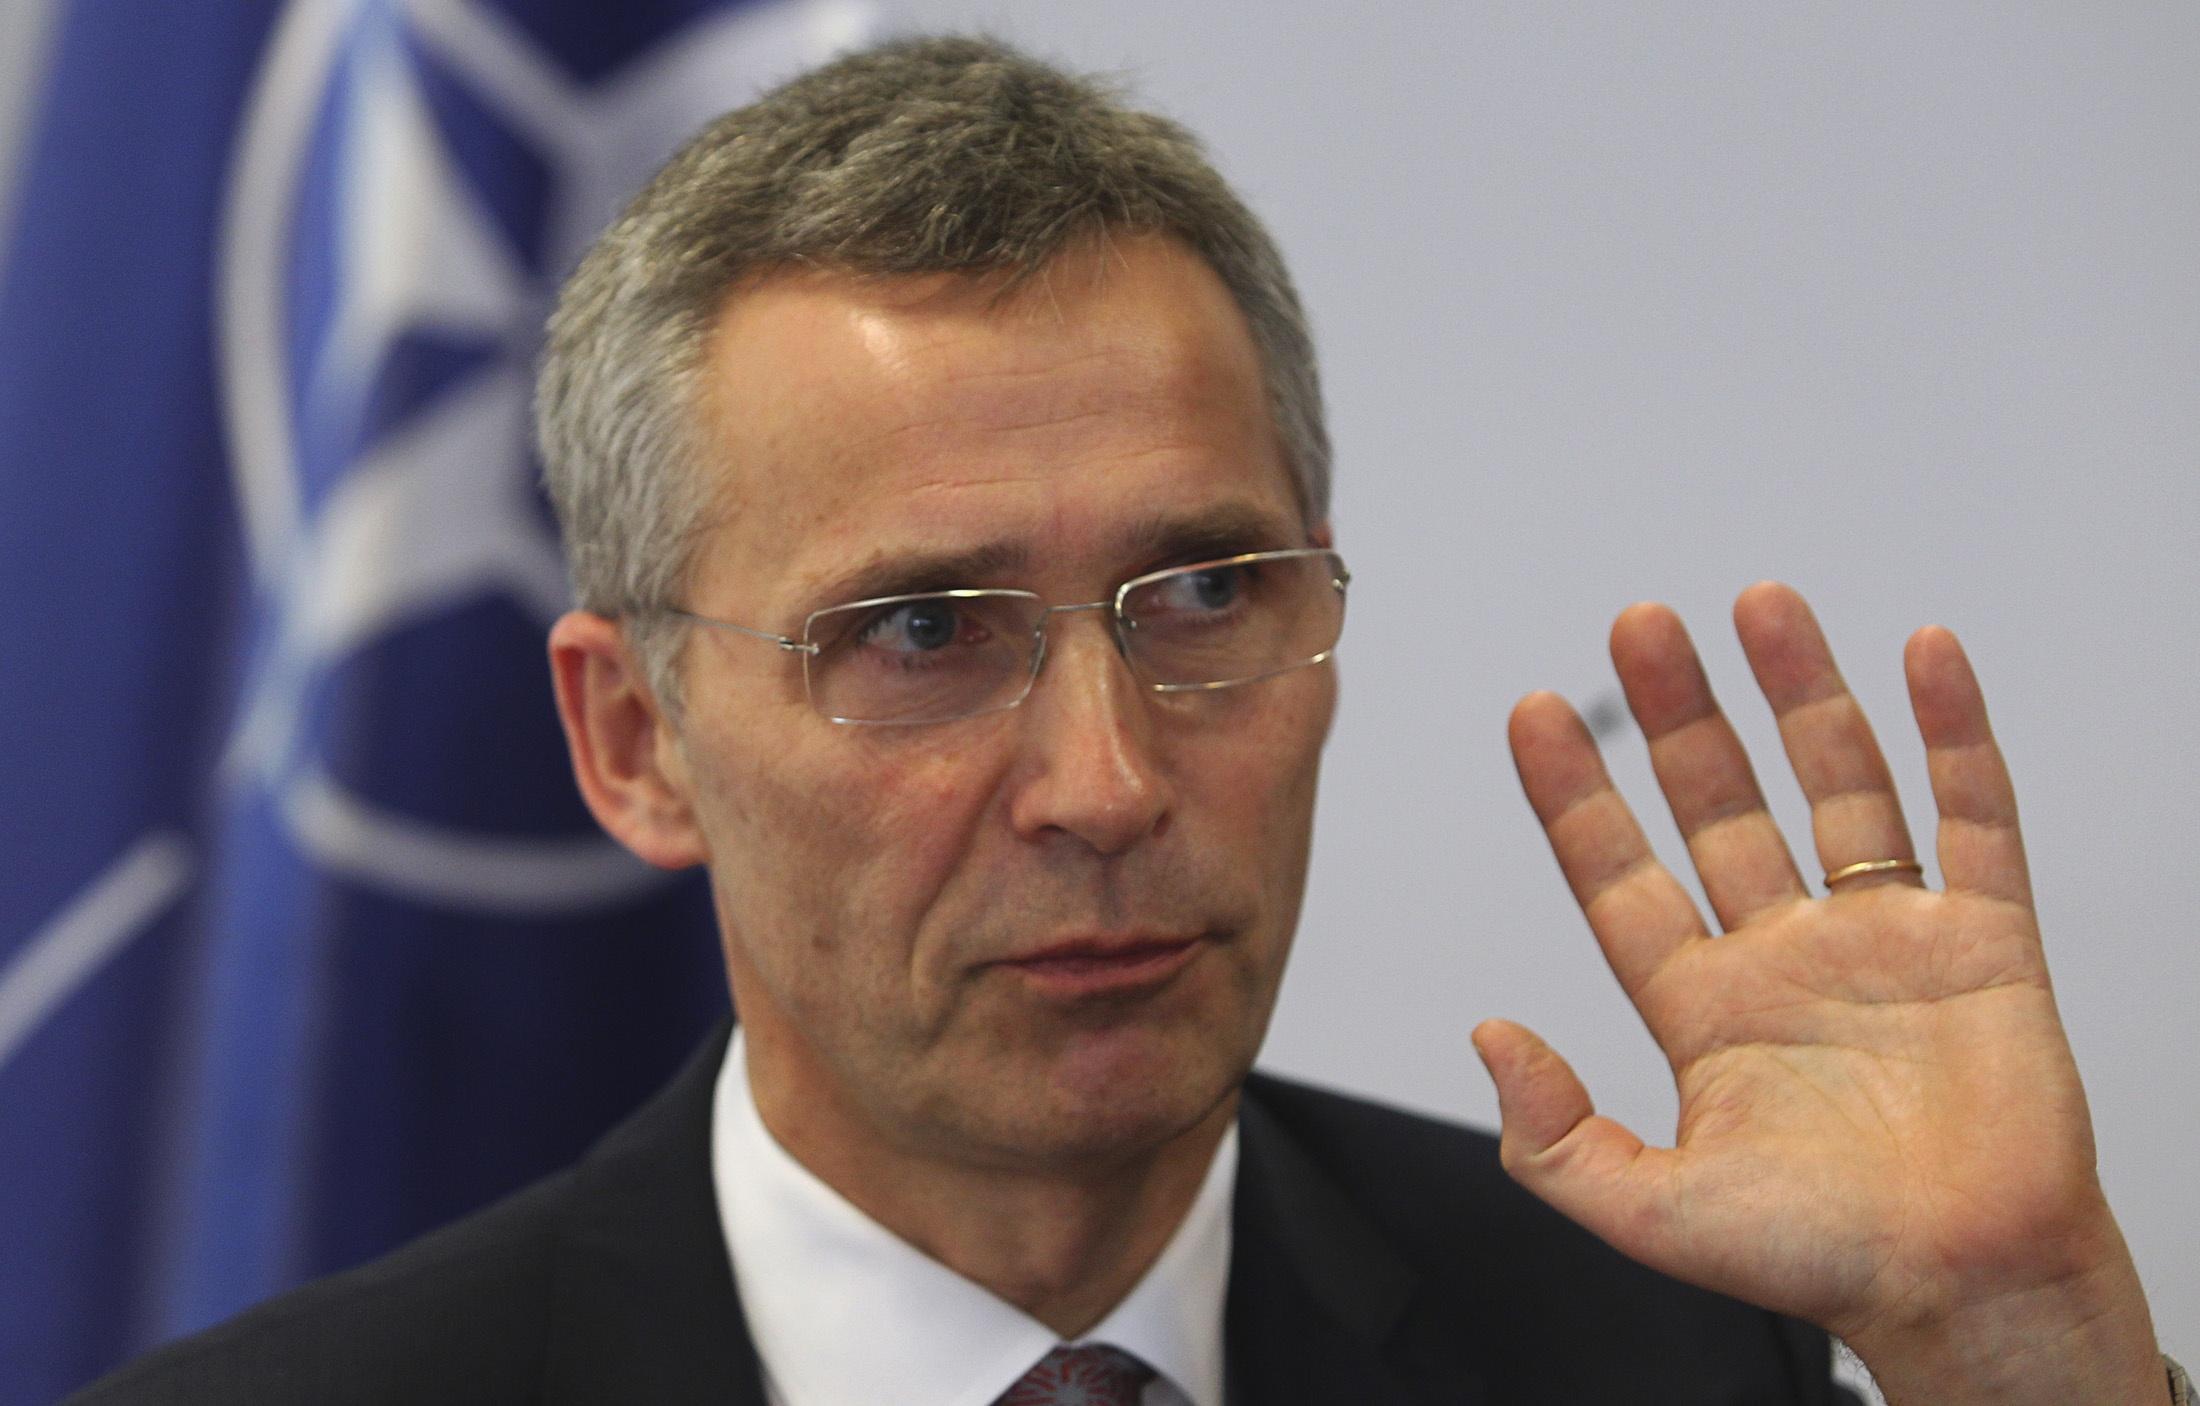 NATO Secretary-General Jens Stoltenberg speaks to Reuters in Pristina January 23, 2015. REUTERS/Hazir Reka (KOSOVO - Tags: POLITICS MILITARY)